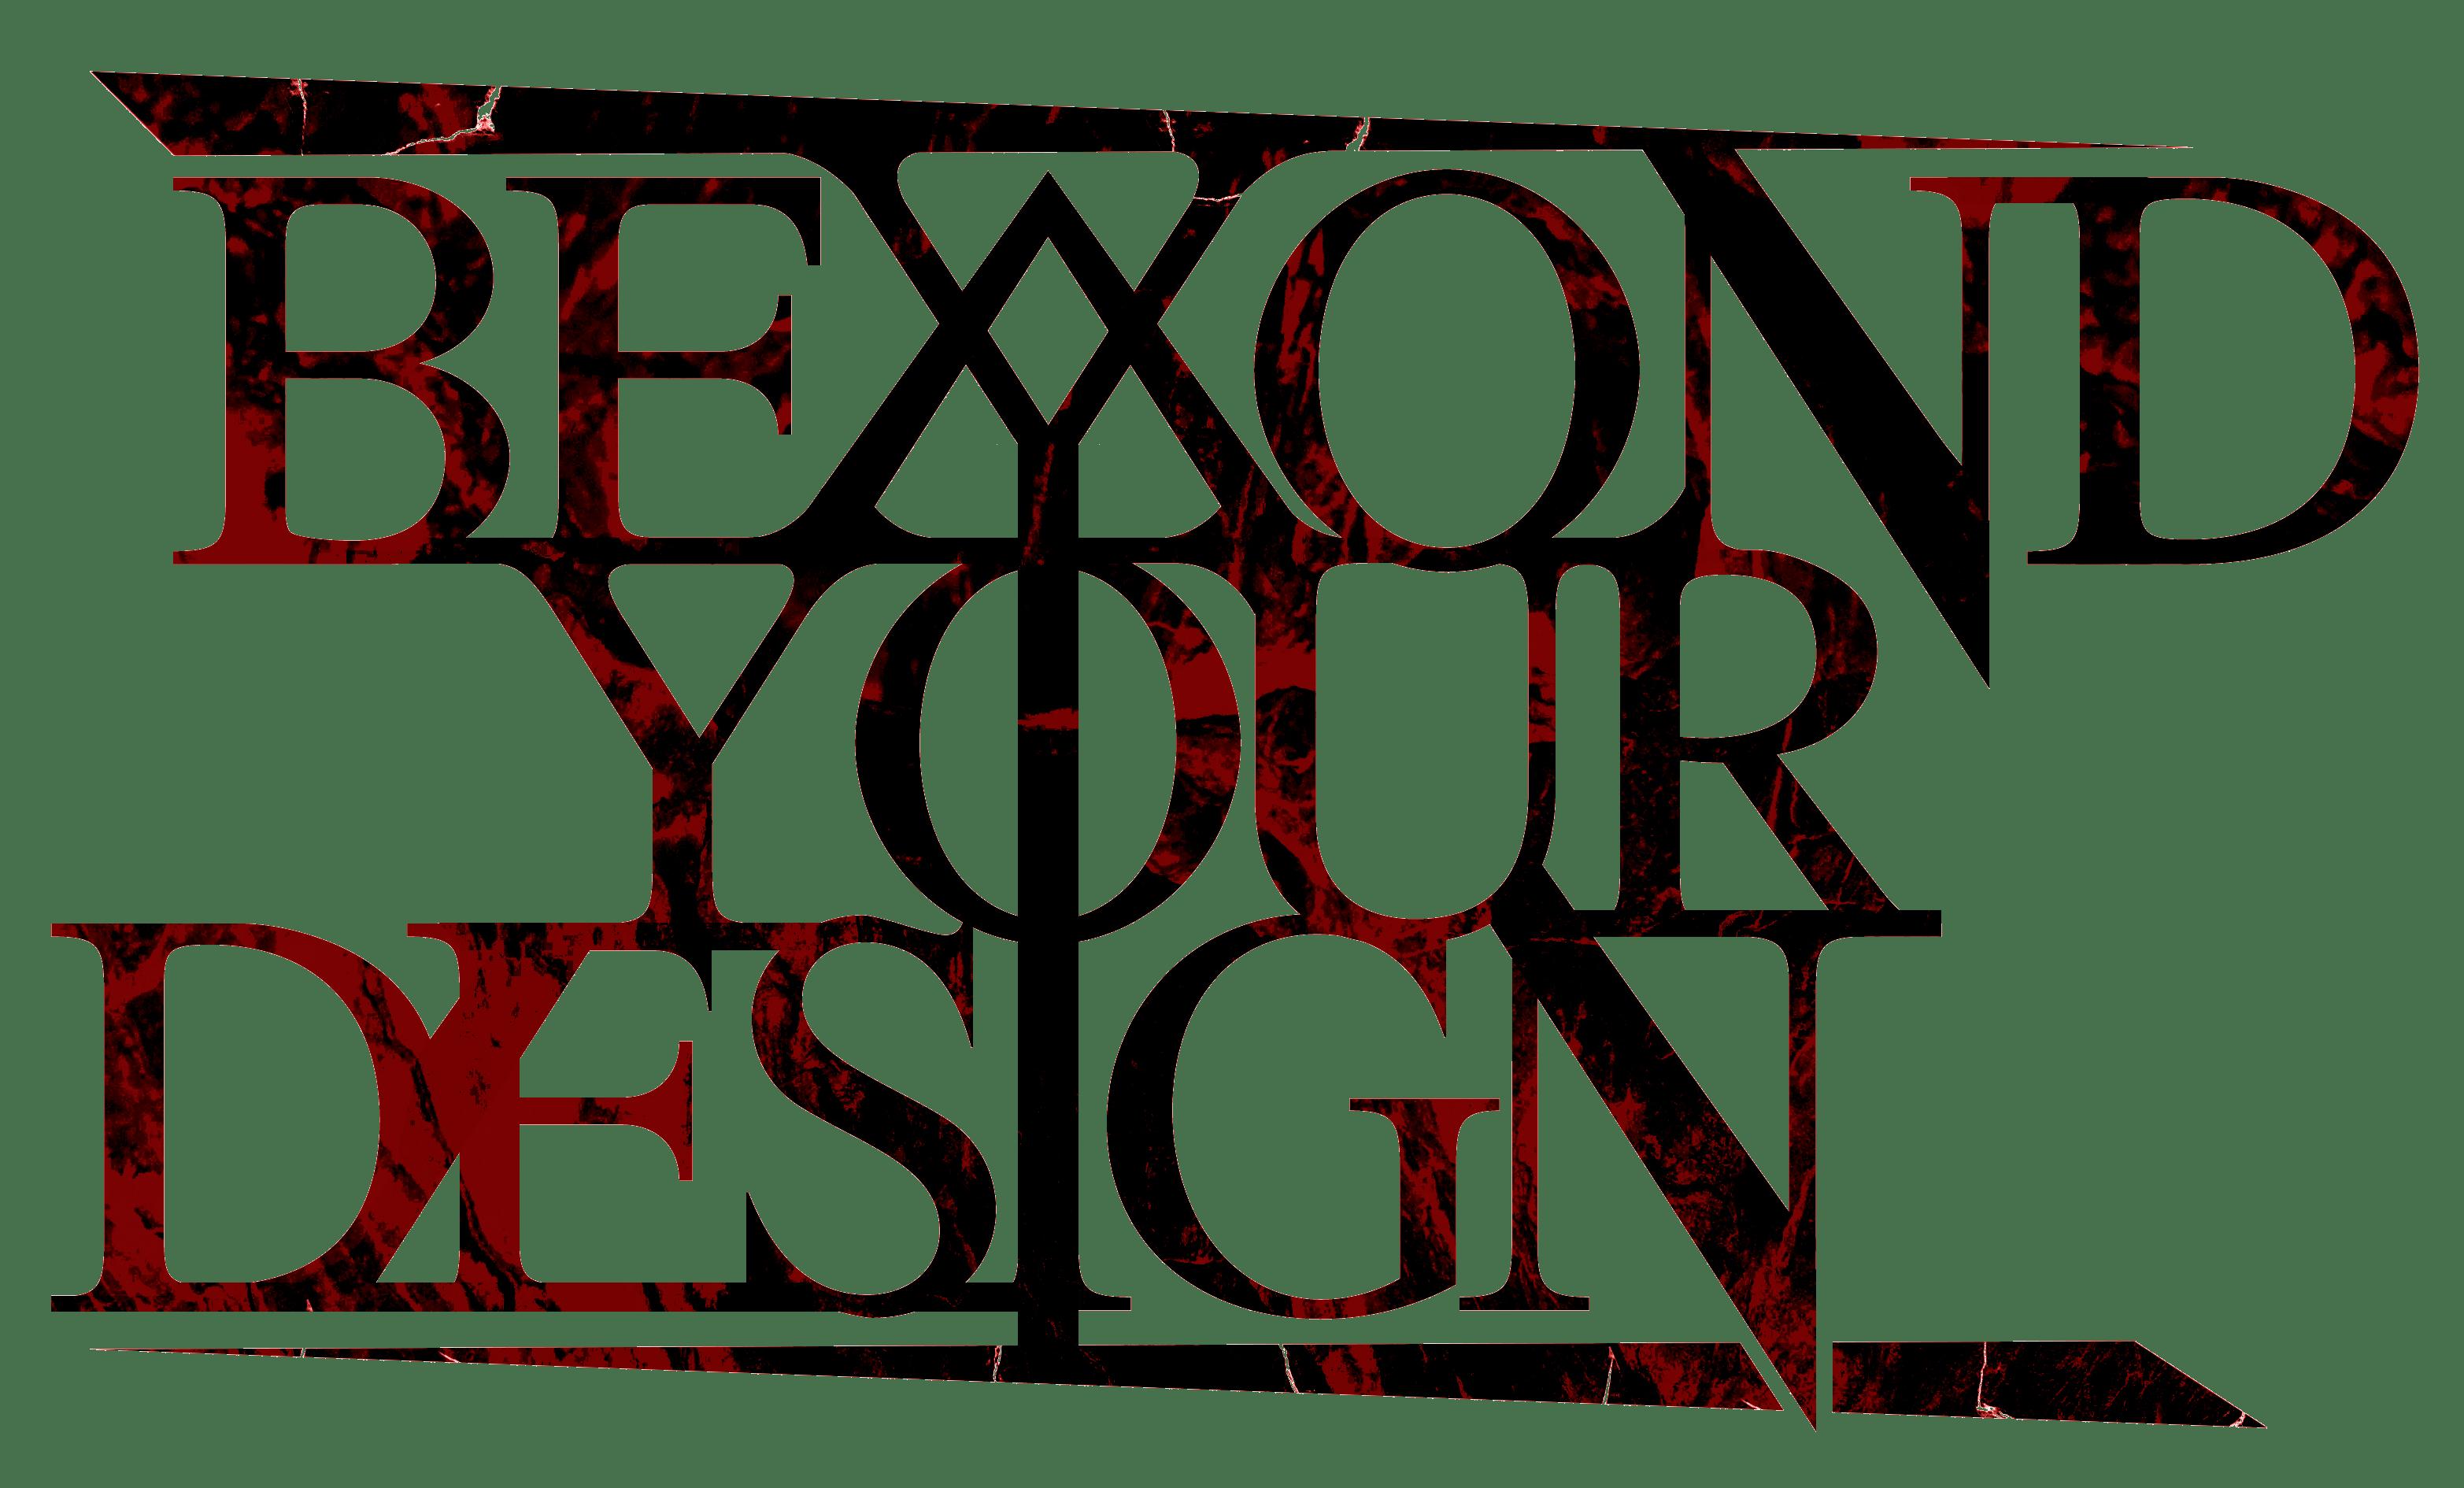 Beyond Your Design logo